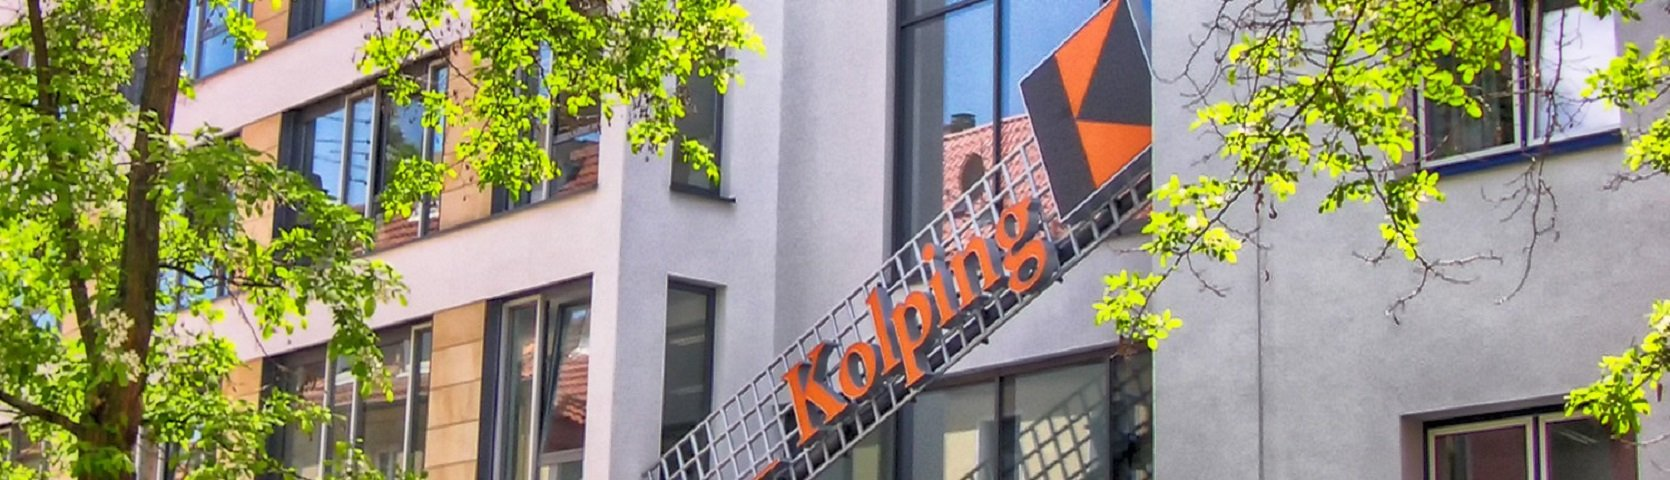 Kolping-Bildungswerk GmbH